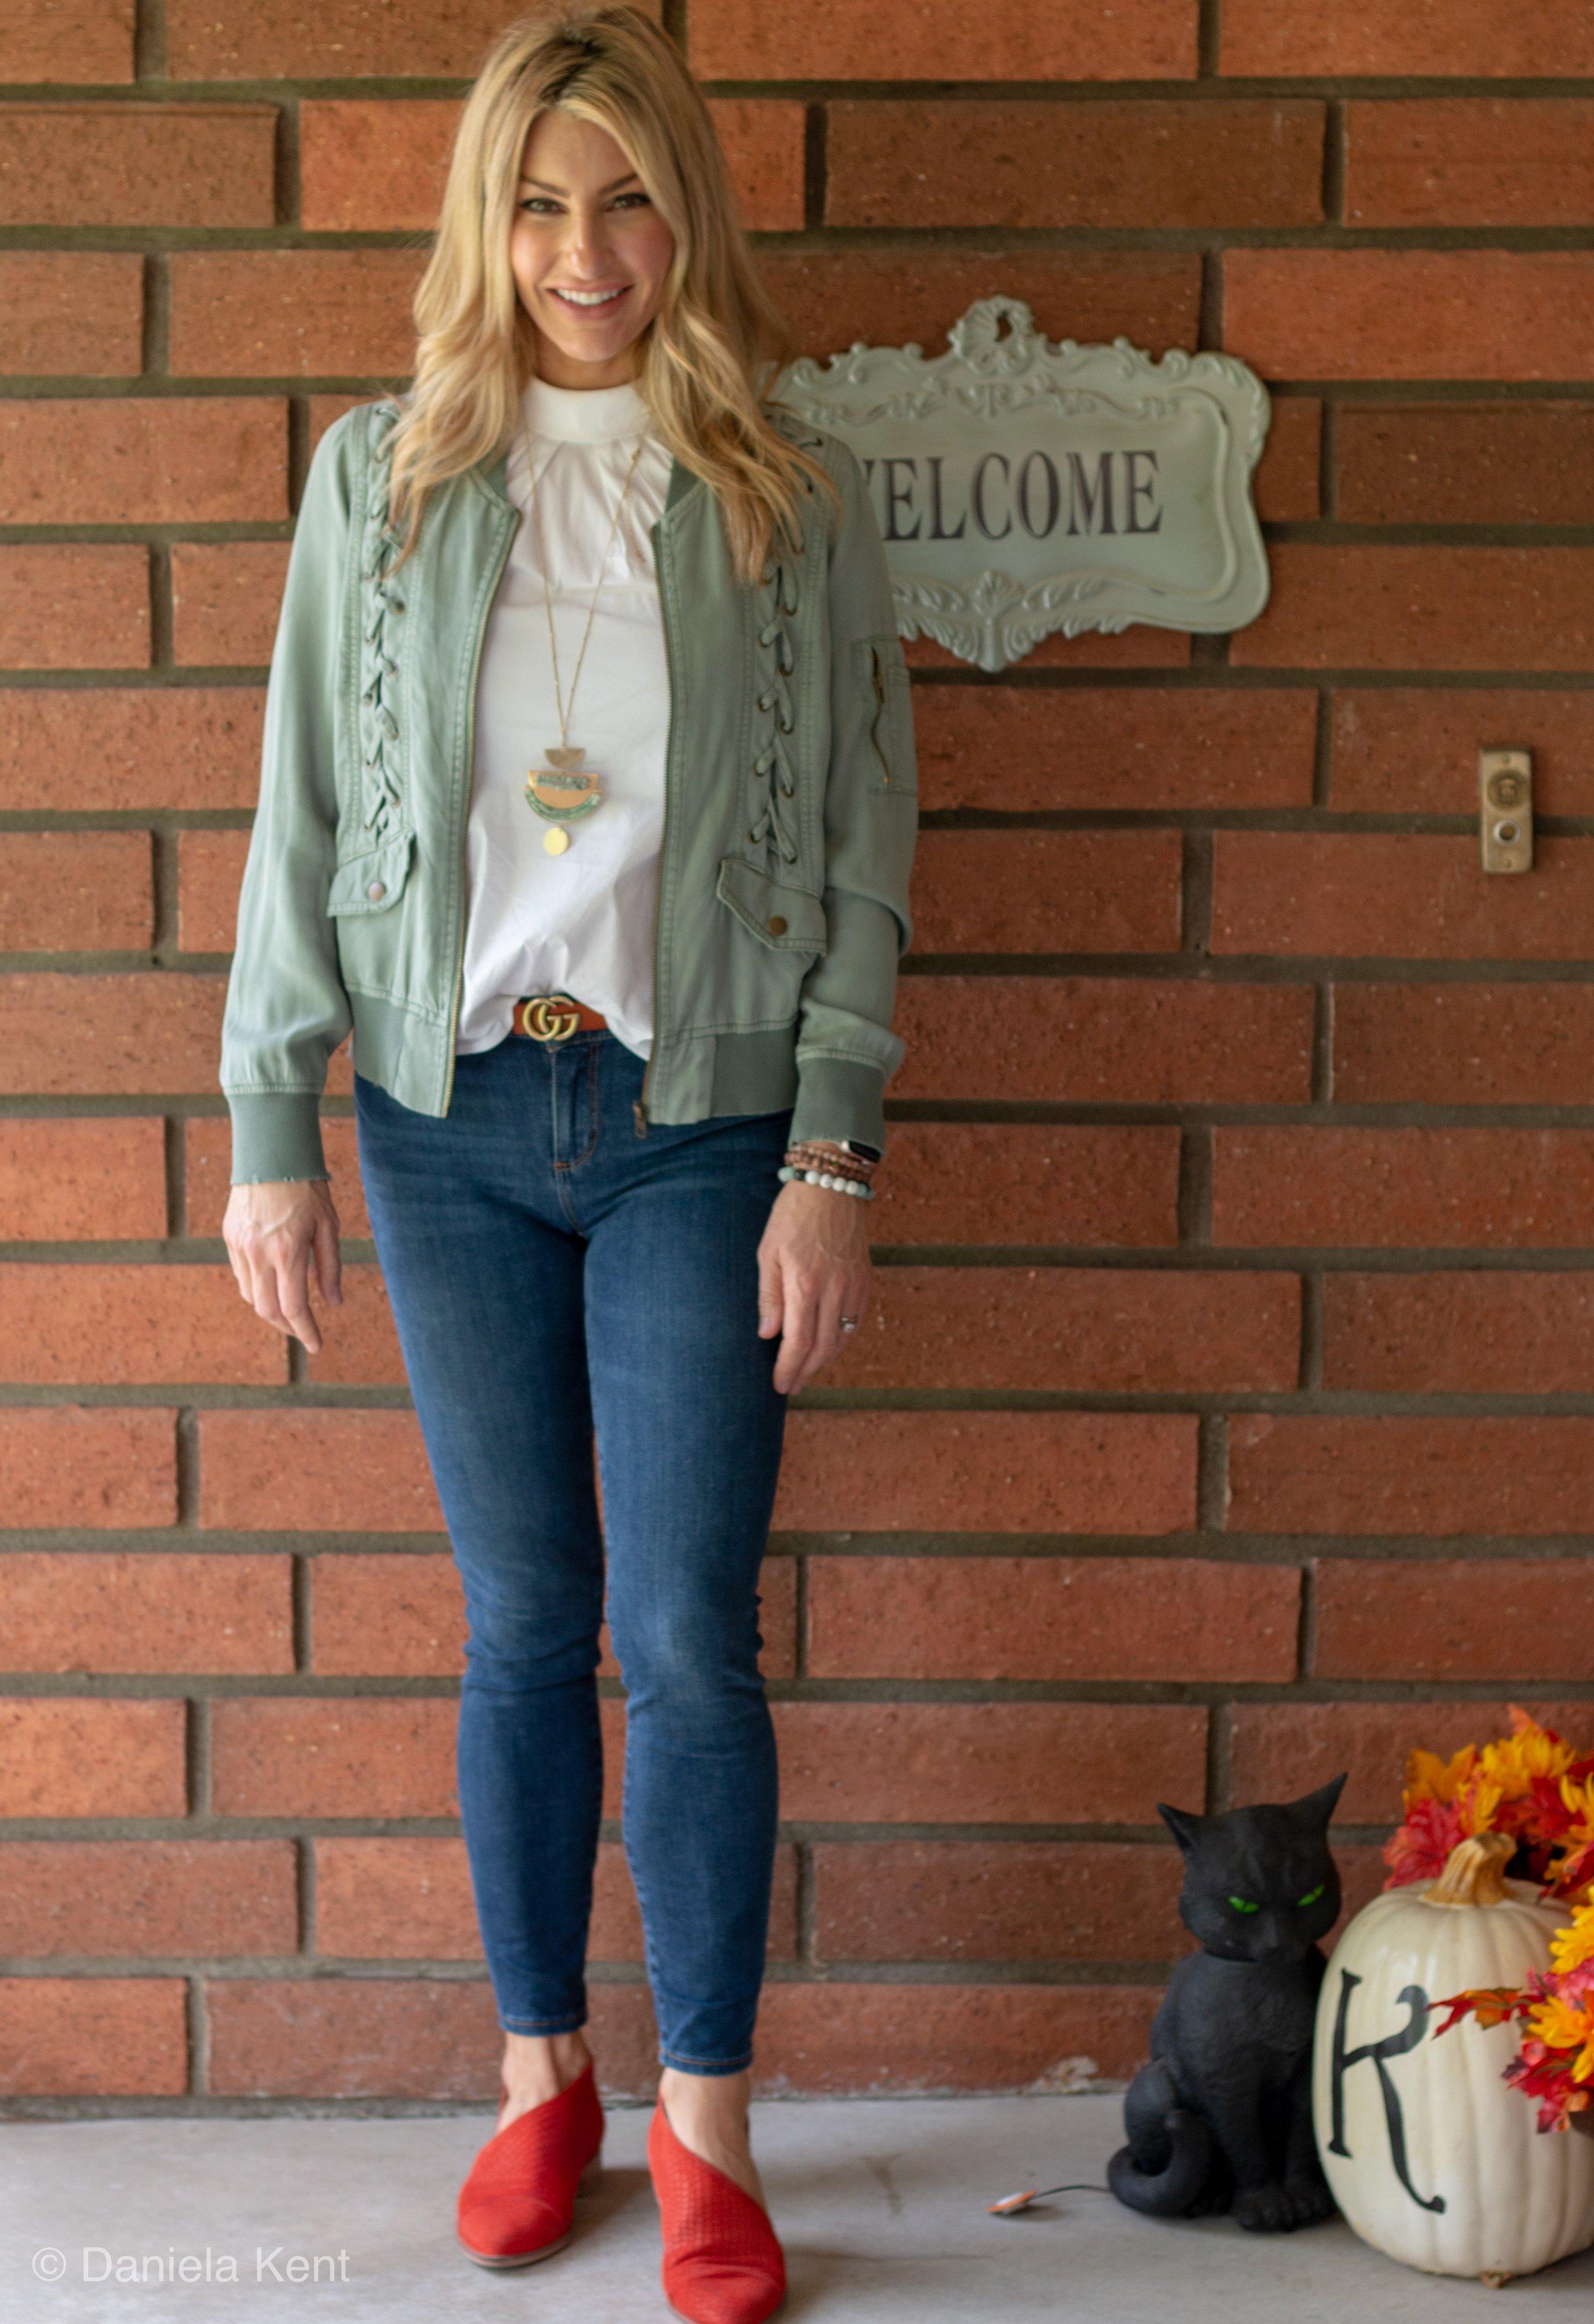 Green lace-up jacket, Dylan Grace Boutique, Glendora, CA.